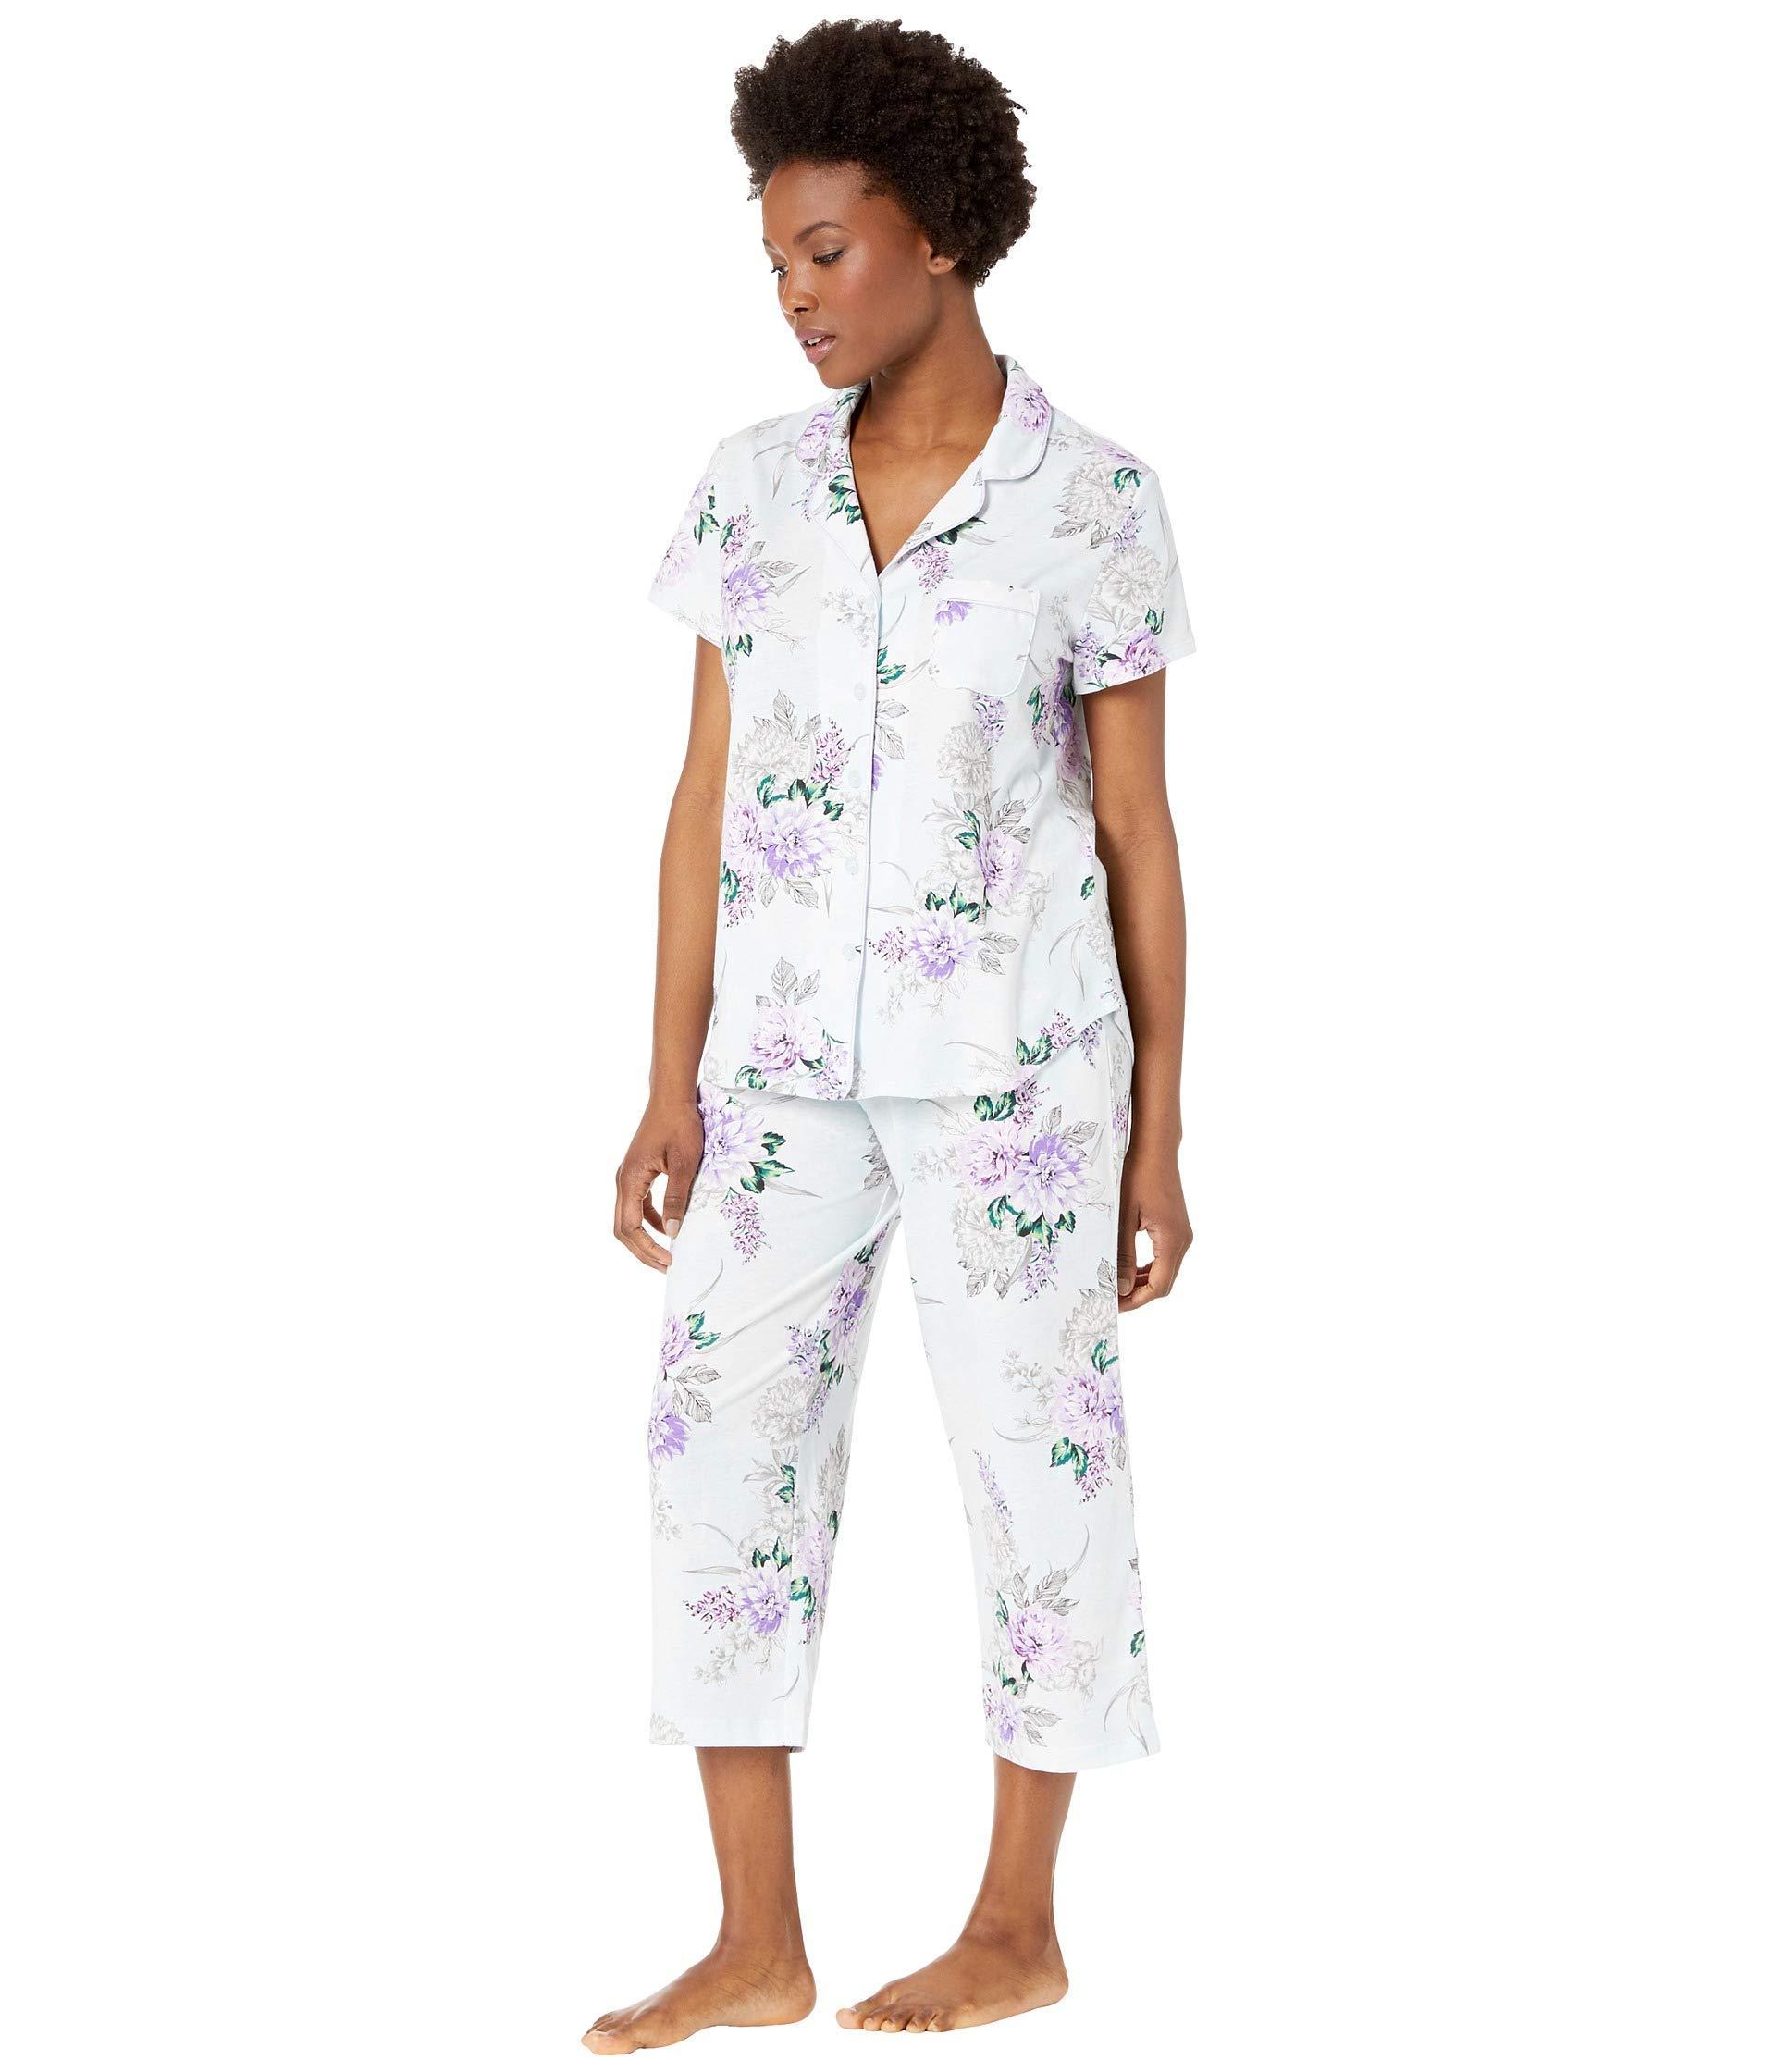 990aadc72e42 Lyst - Karen Neuburger Petite Seranade Short Sleeve Girlfriend Capris Pj  (floral ice Blue) Women s Pajama Sets in Blue